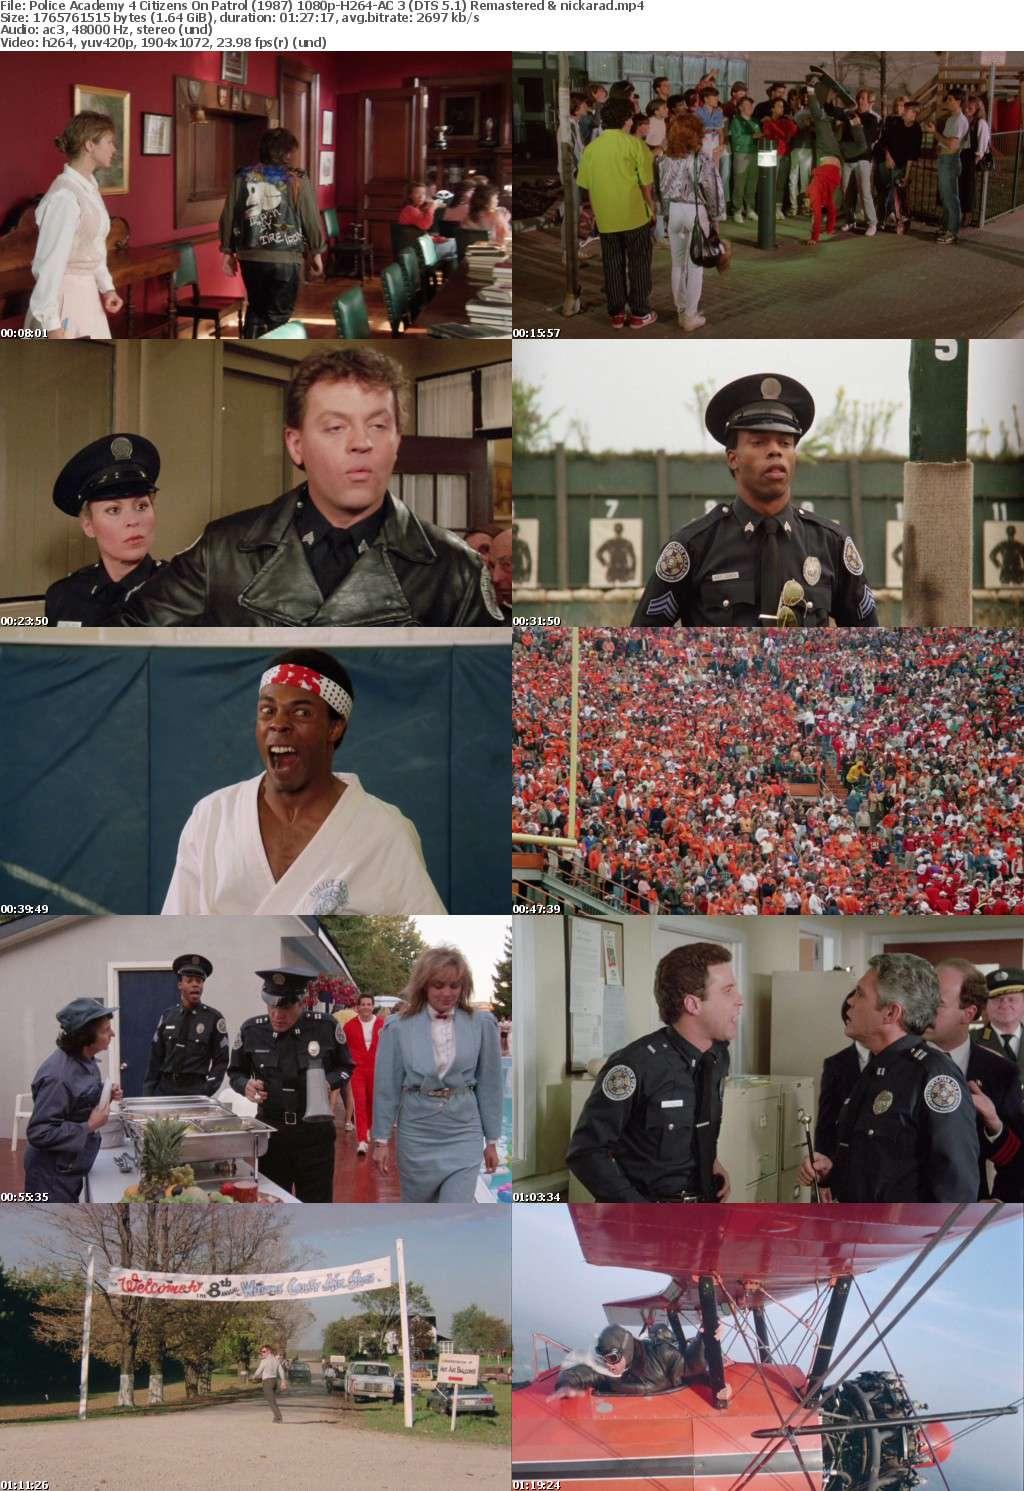 Police Academy 4 Citizens On Patrol (1987) 1080p BluRay H264 AC 3 Remastered-nickarad